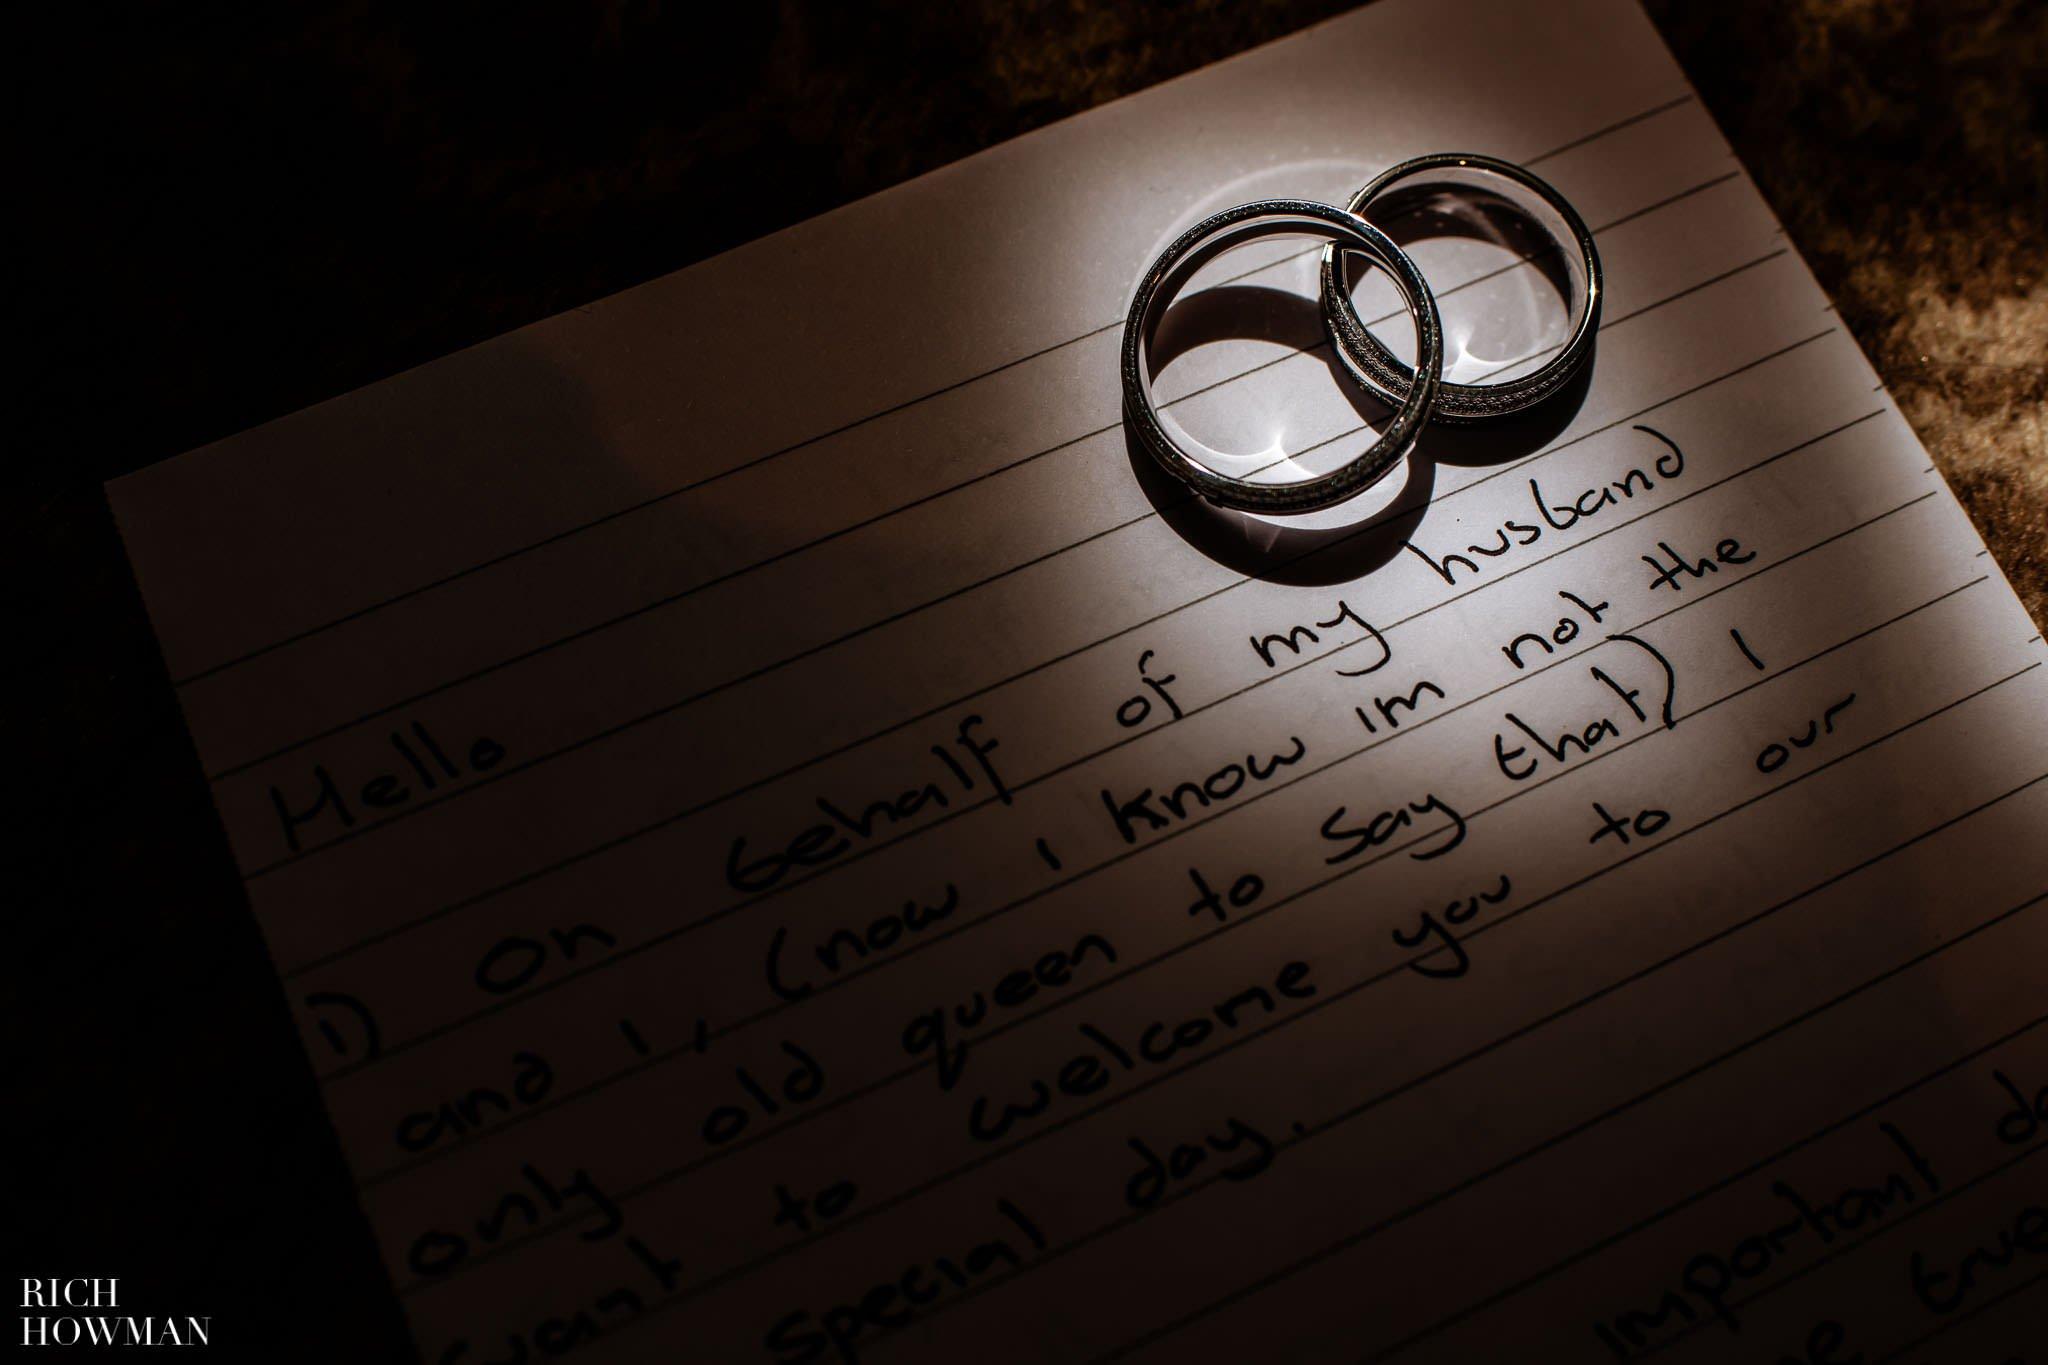 wedding rings on the corner of a handwritten speech captured by ellenborough park wedding photographer, Rich Howman